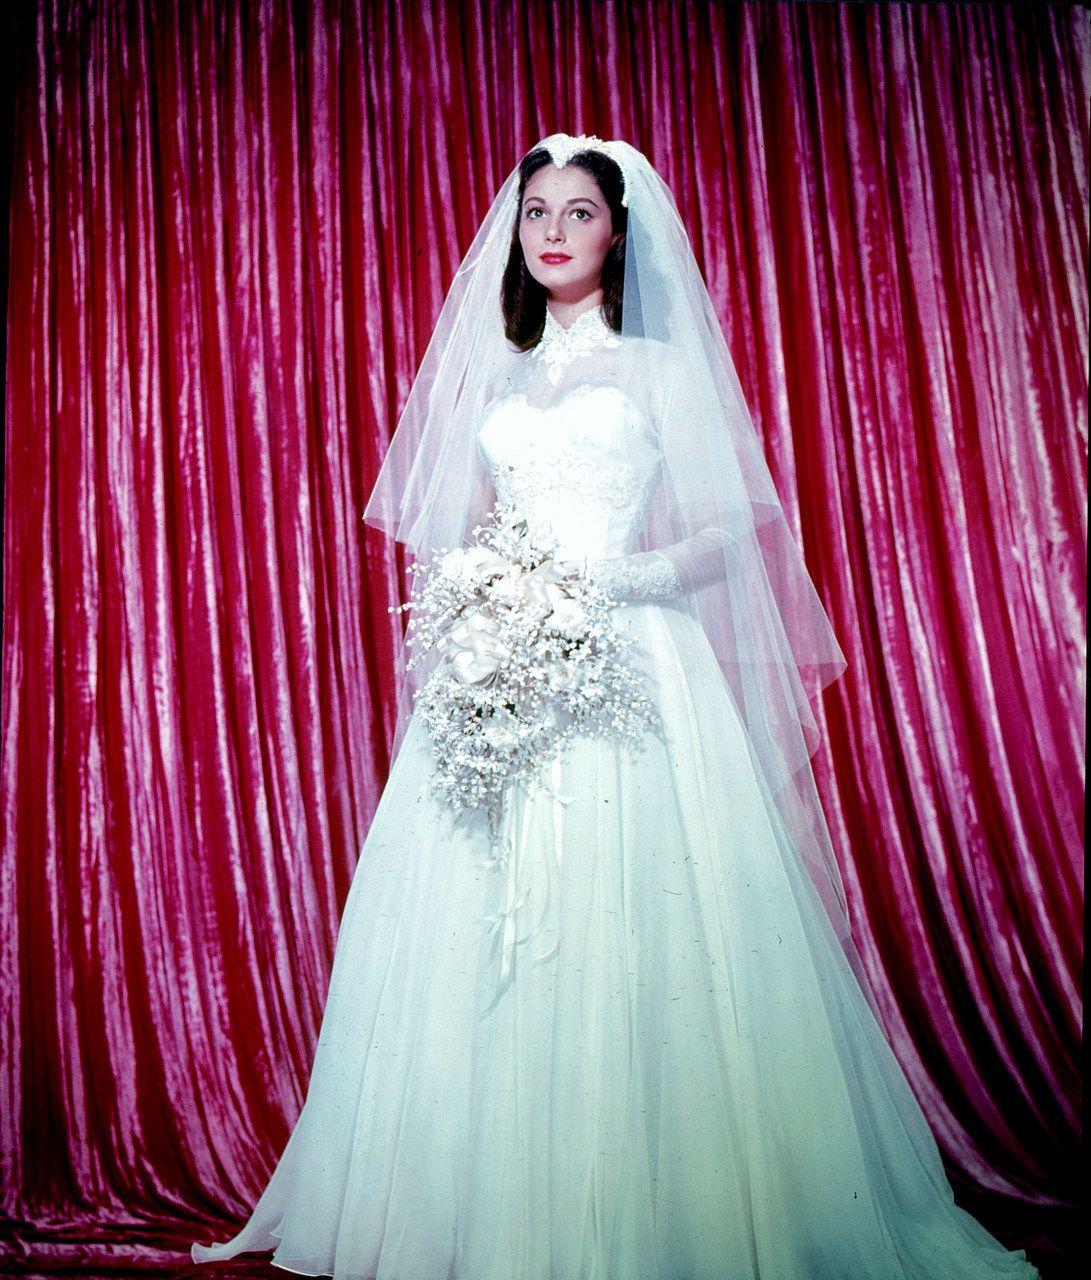 Chic Vintage Bride – Pier Angeli